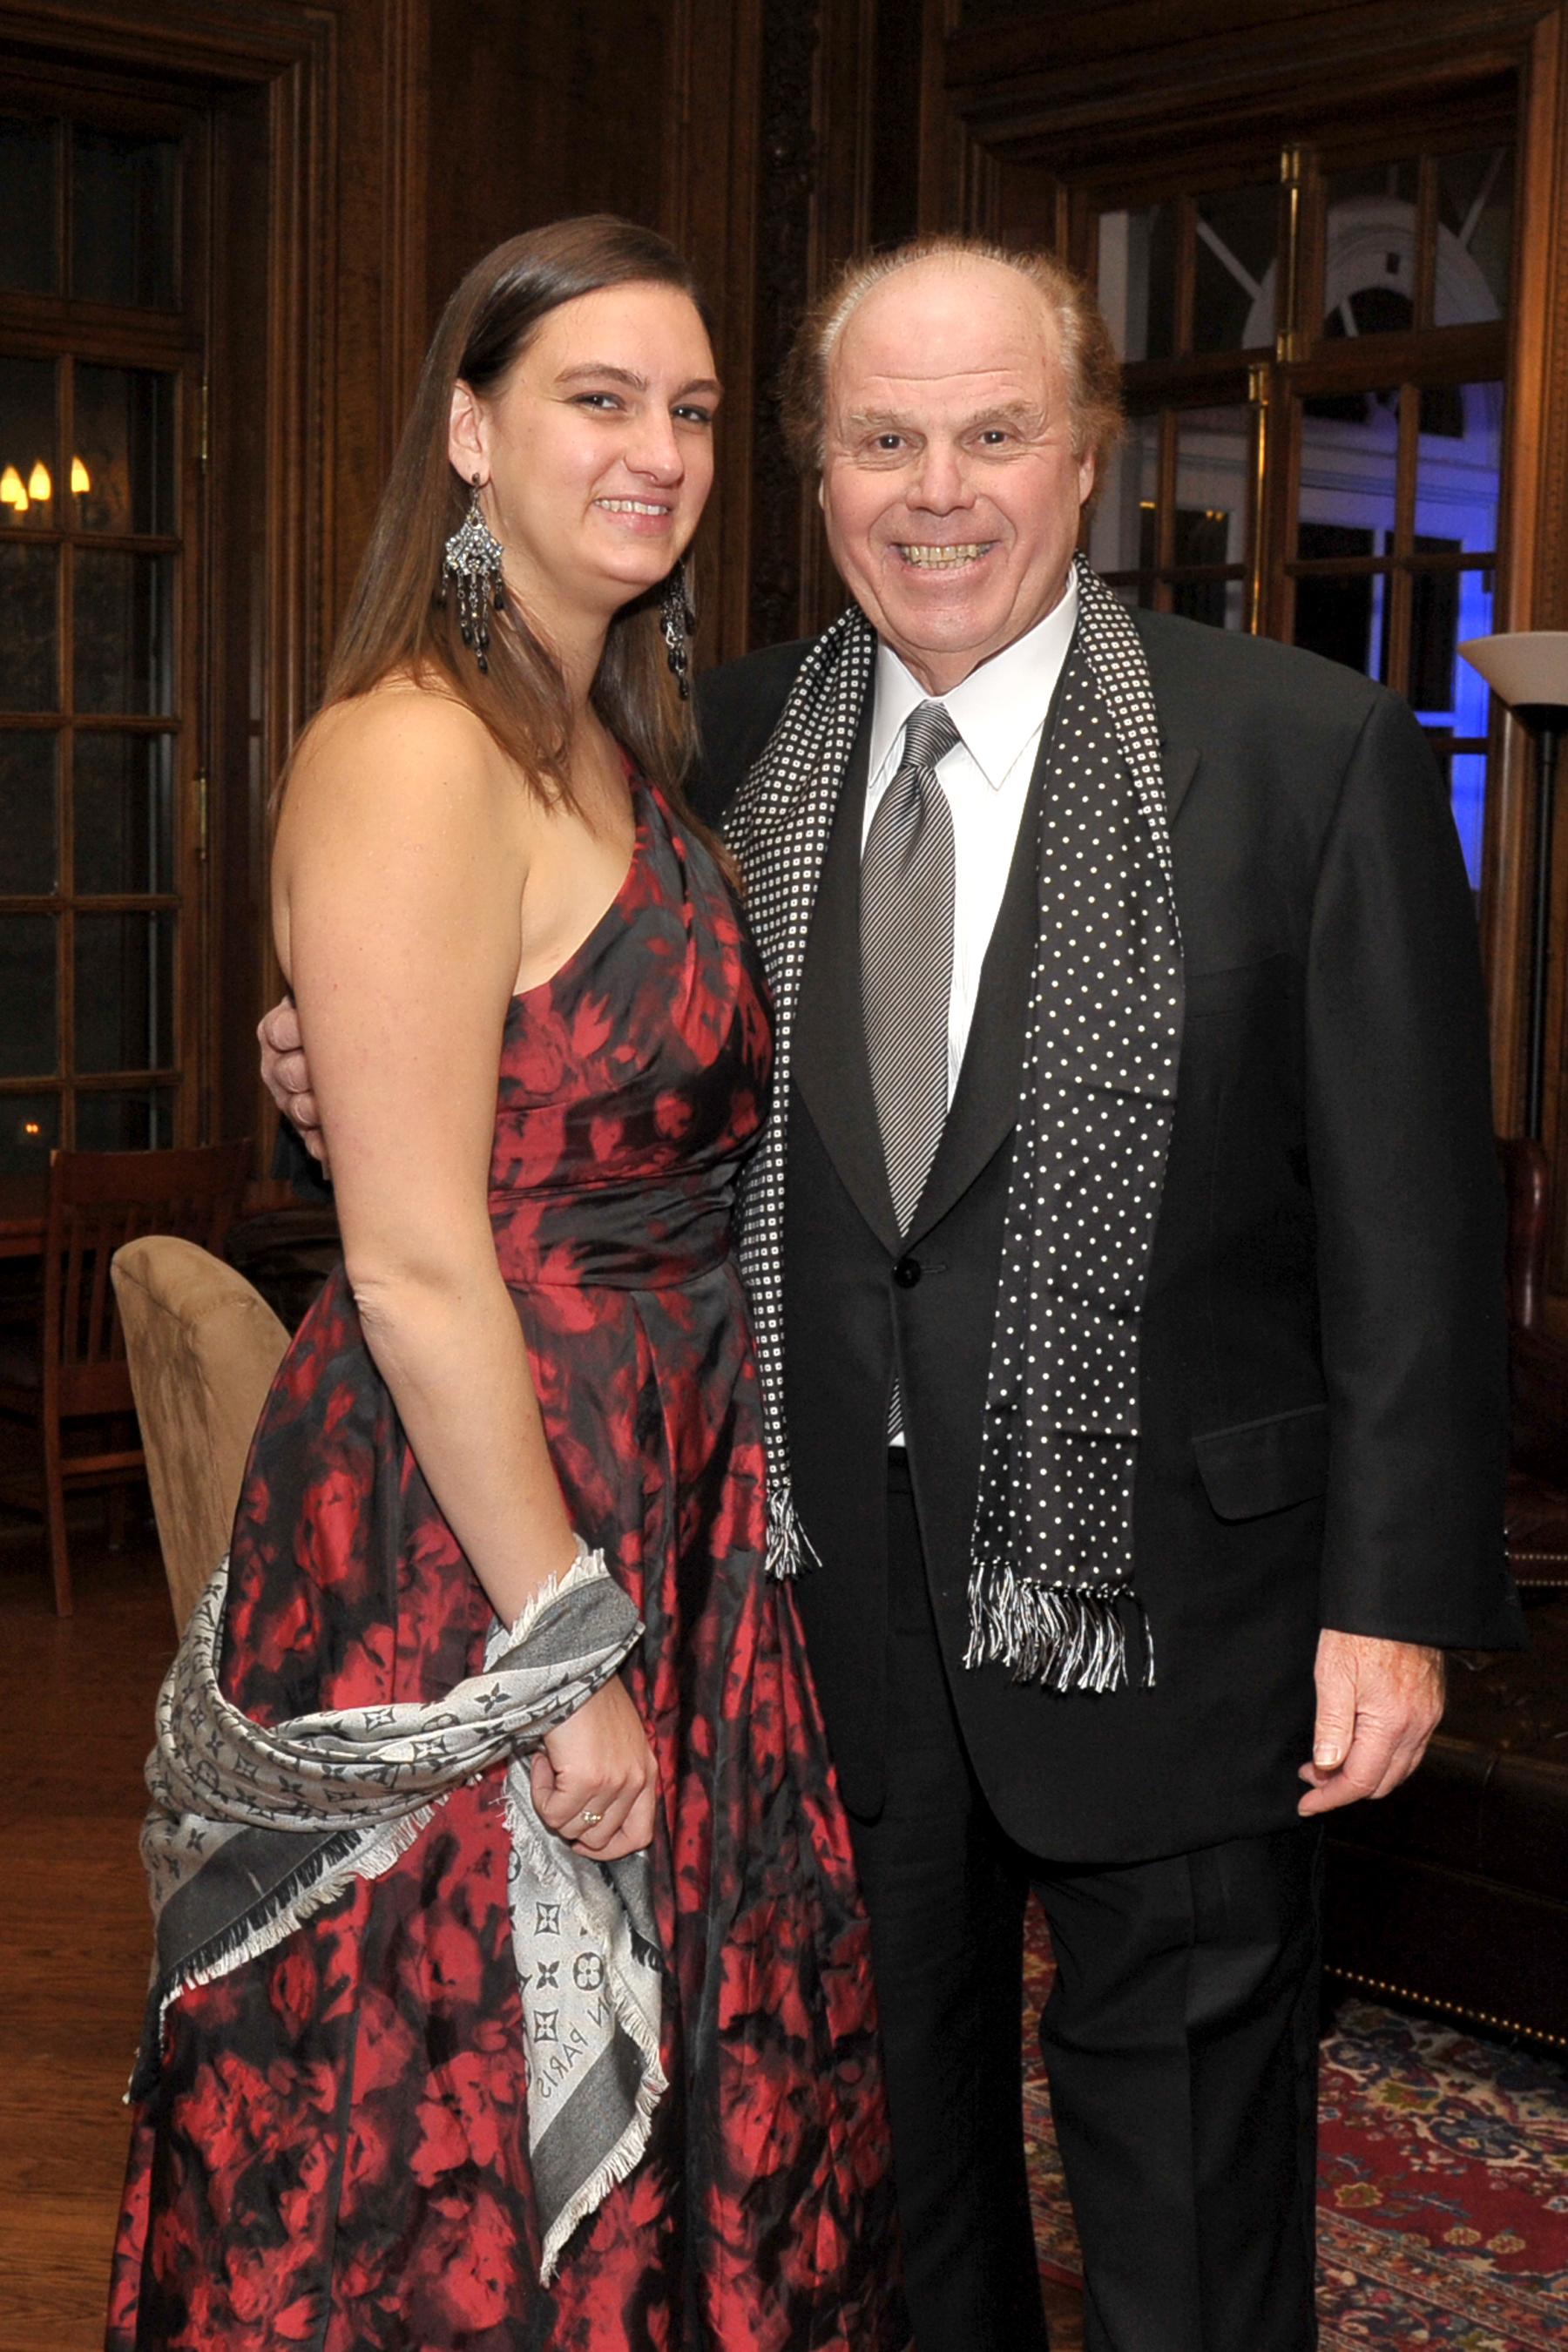 Raymond Frick and daughter Samantha Frick